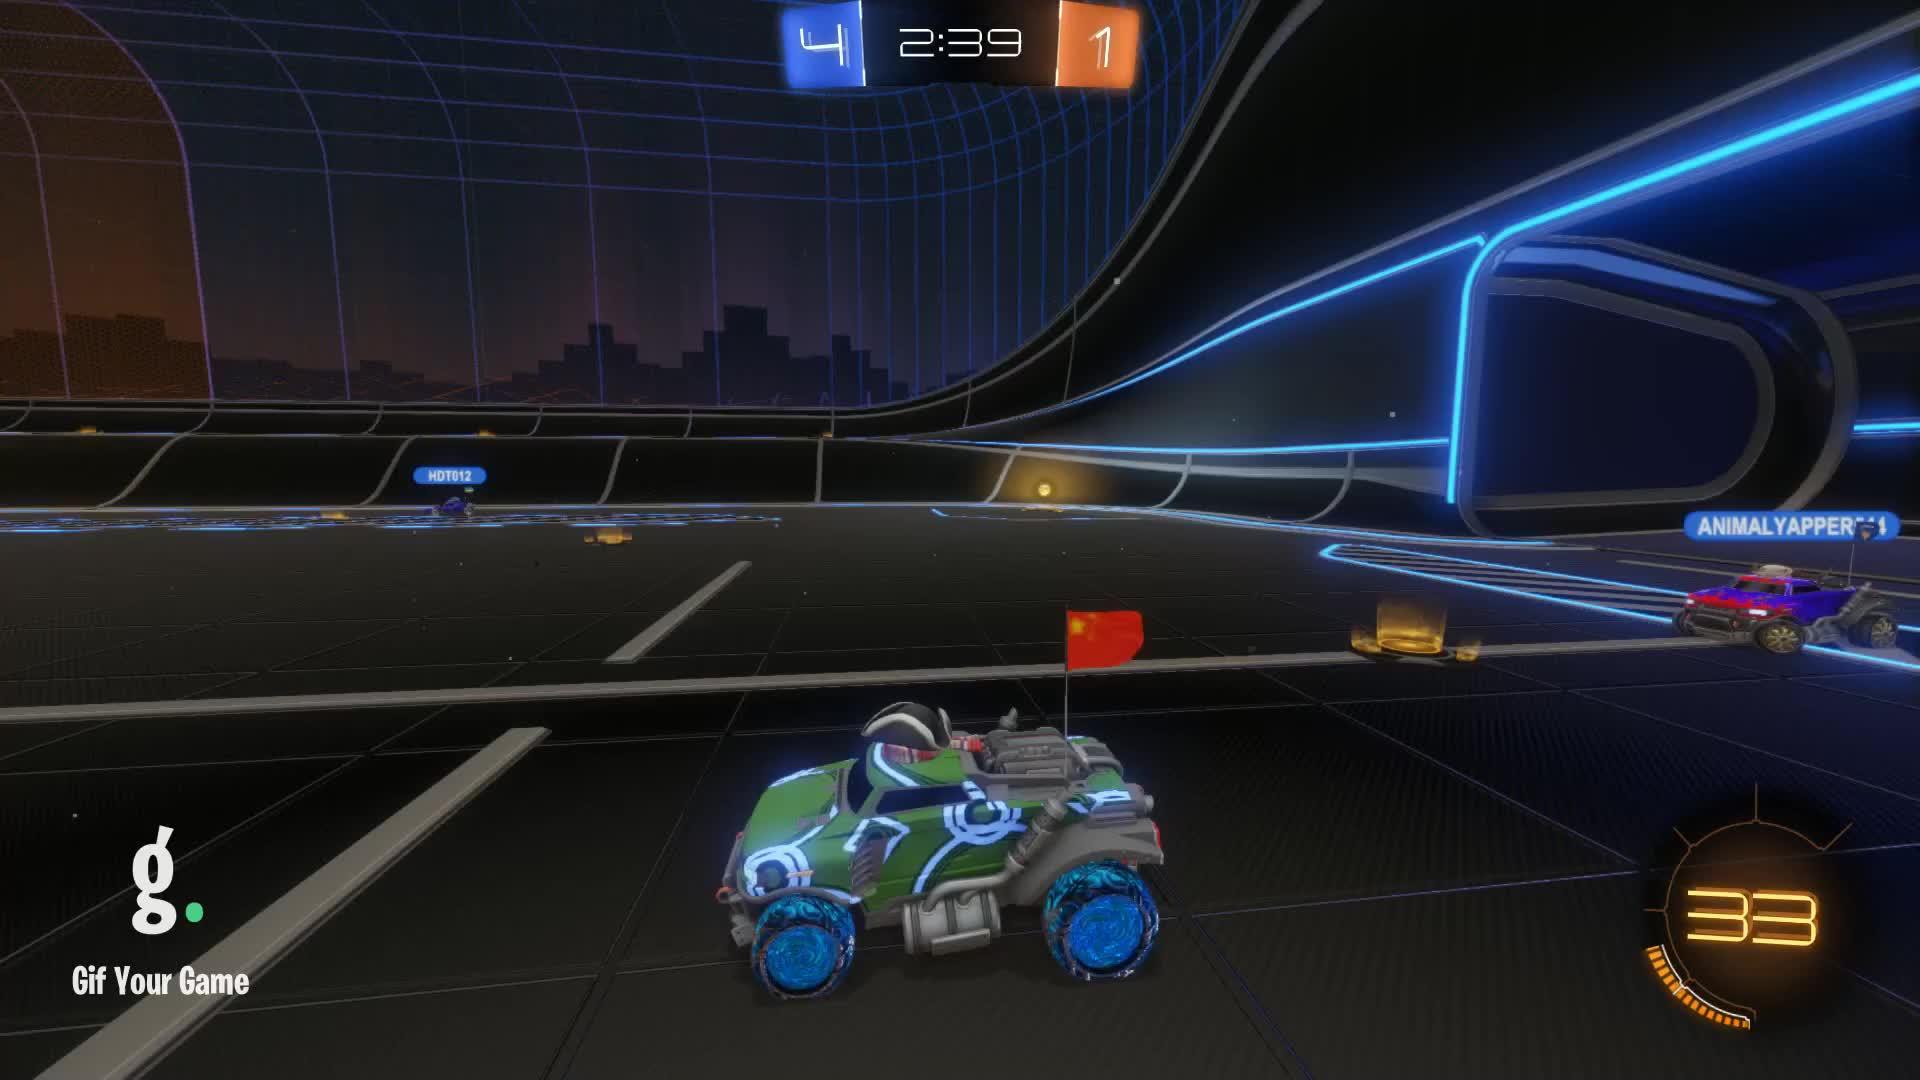 Gif Your Game, GifYourGame, Goal, JordanMG, Rocket League, RocketLeague, Goal 6: JordanMG GIFs